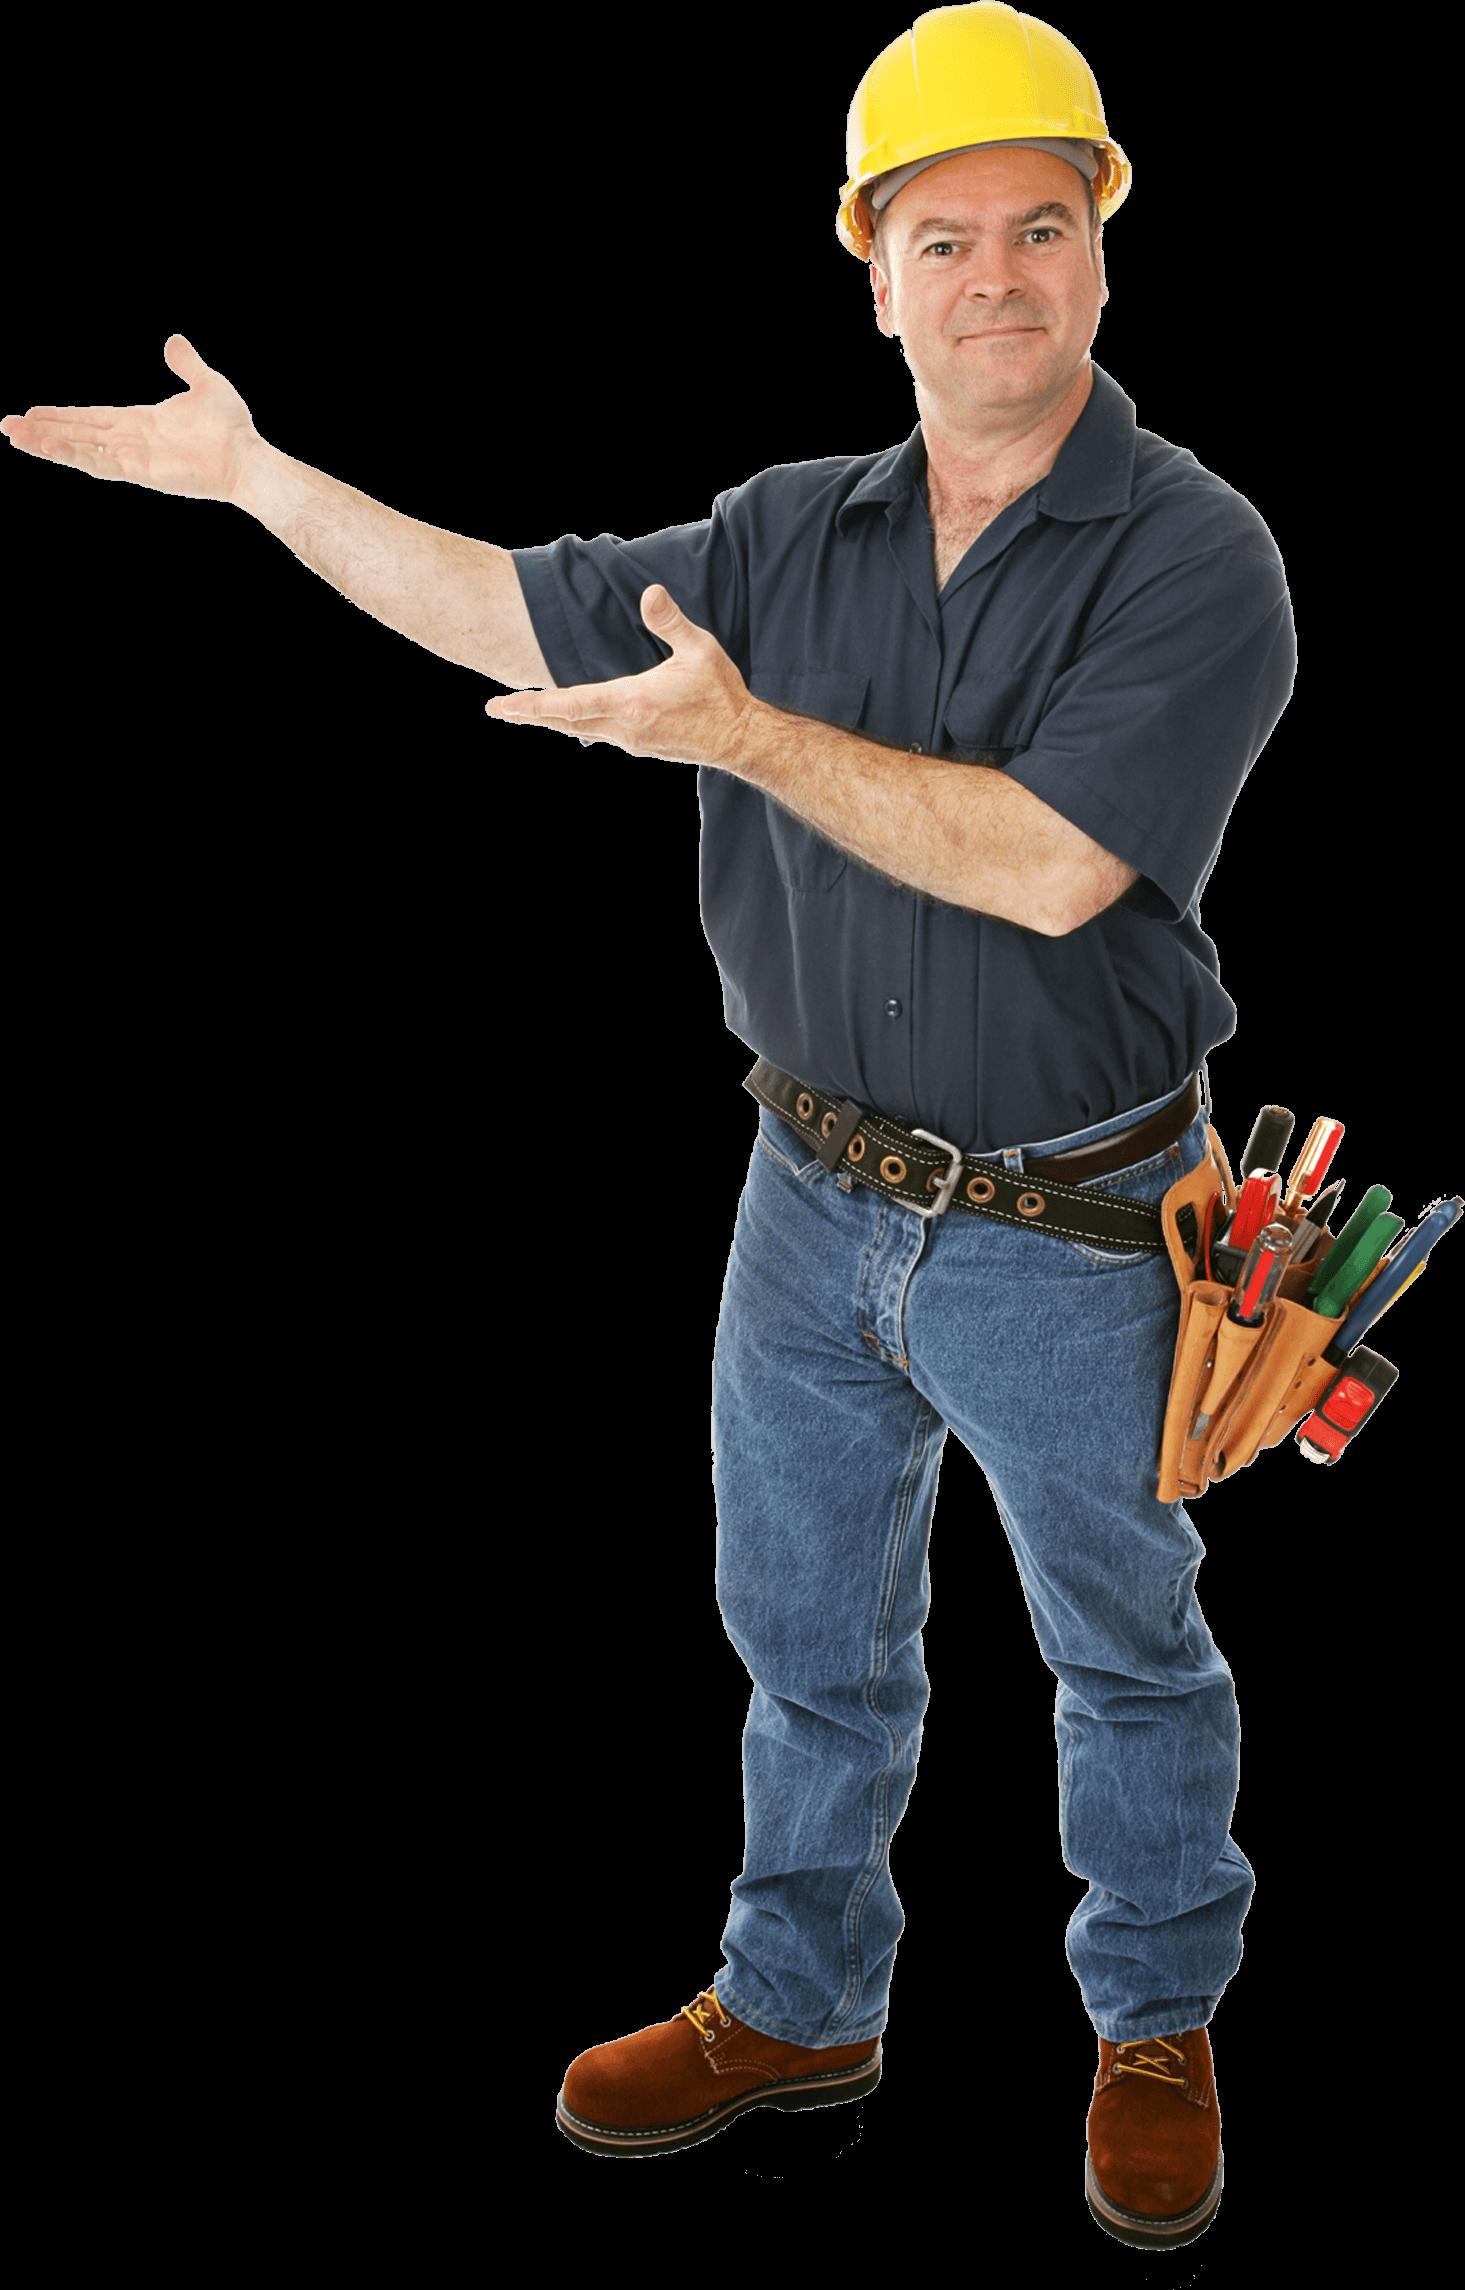 Clipart man builder. Transparent png stickpng